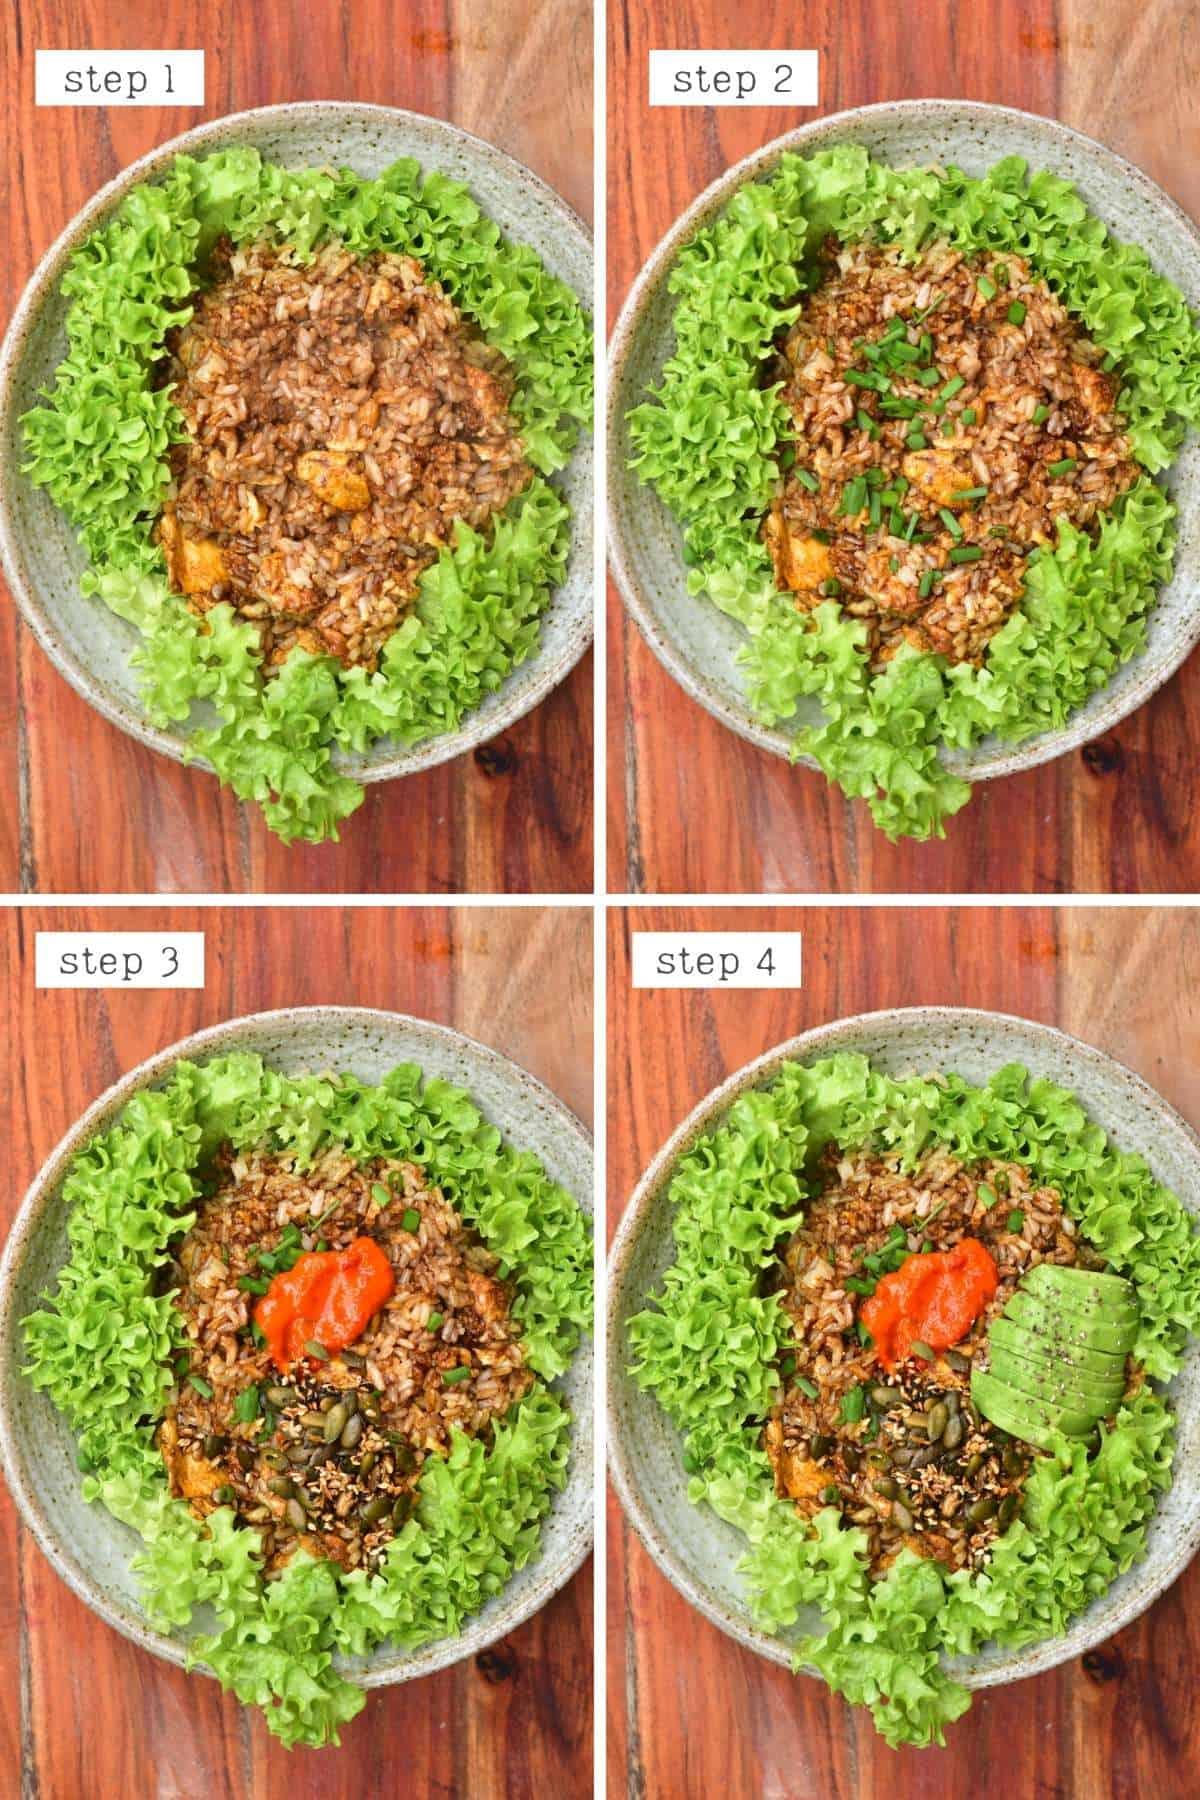 Steps for serving rice breakfast